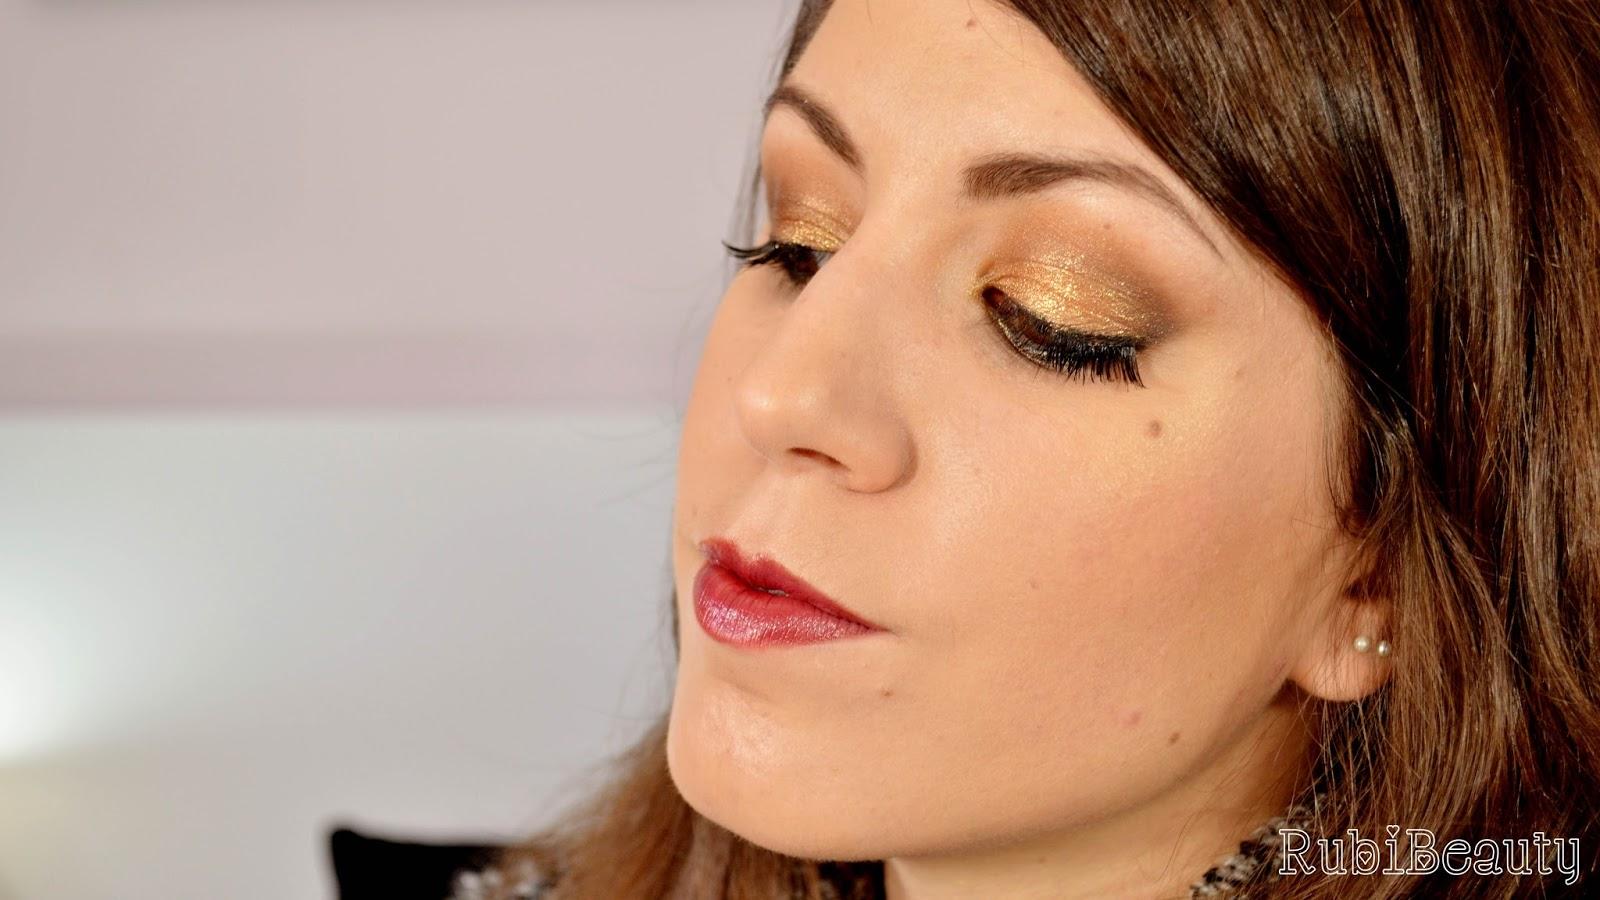 rubibeauty maquillaje dorado makeup look gold fiestas navidad christmas fin de año